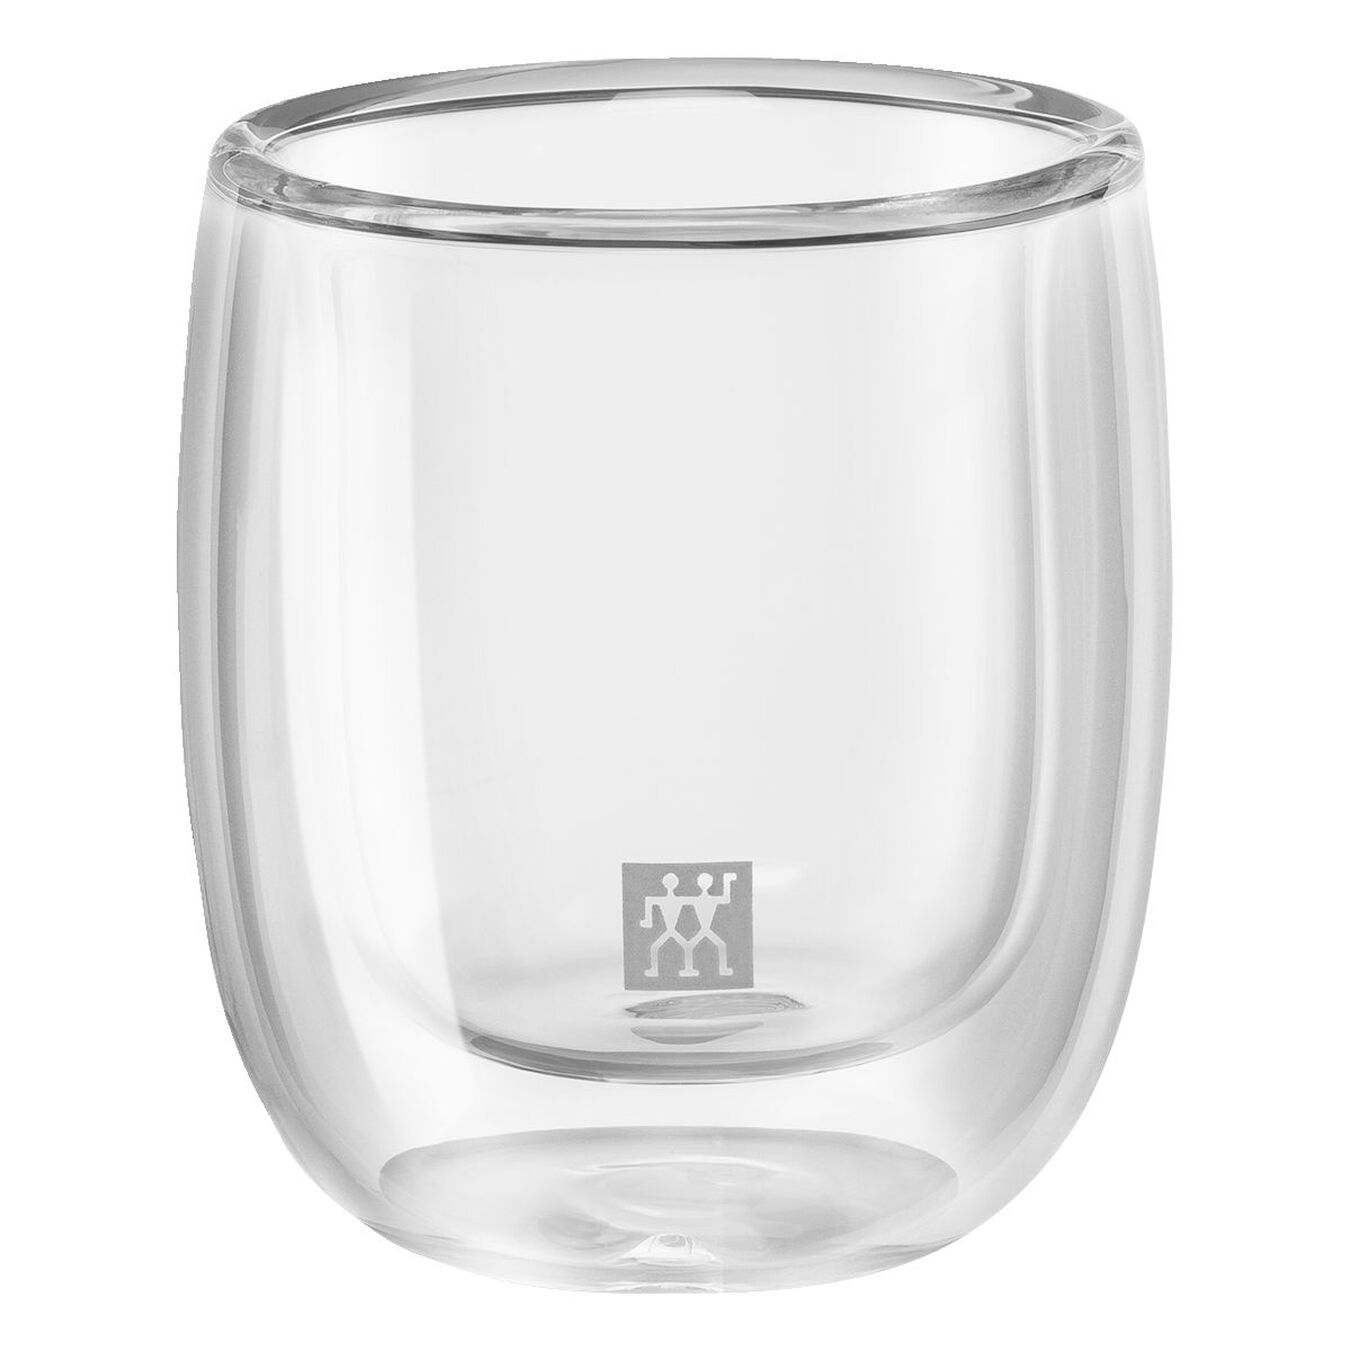 Çift Camlı Espresso bardağı seti, 2-parça,,large 2